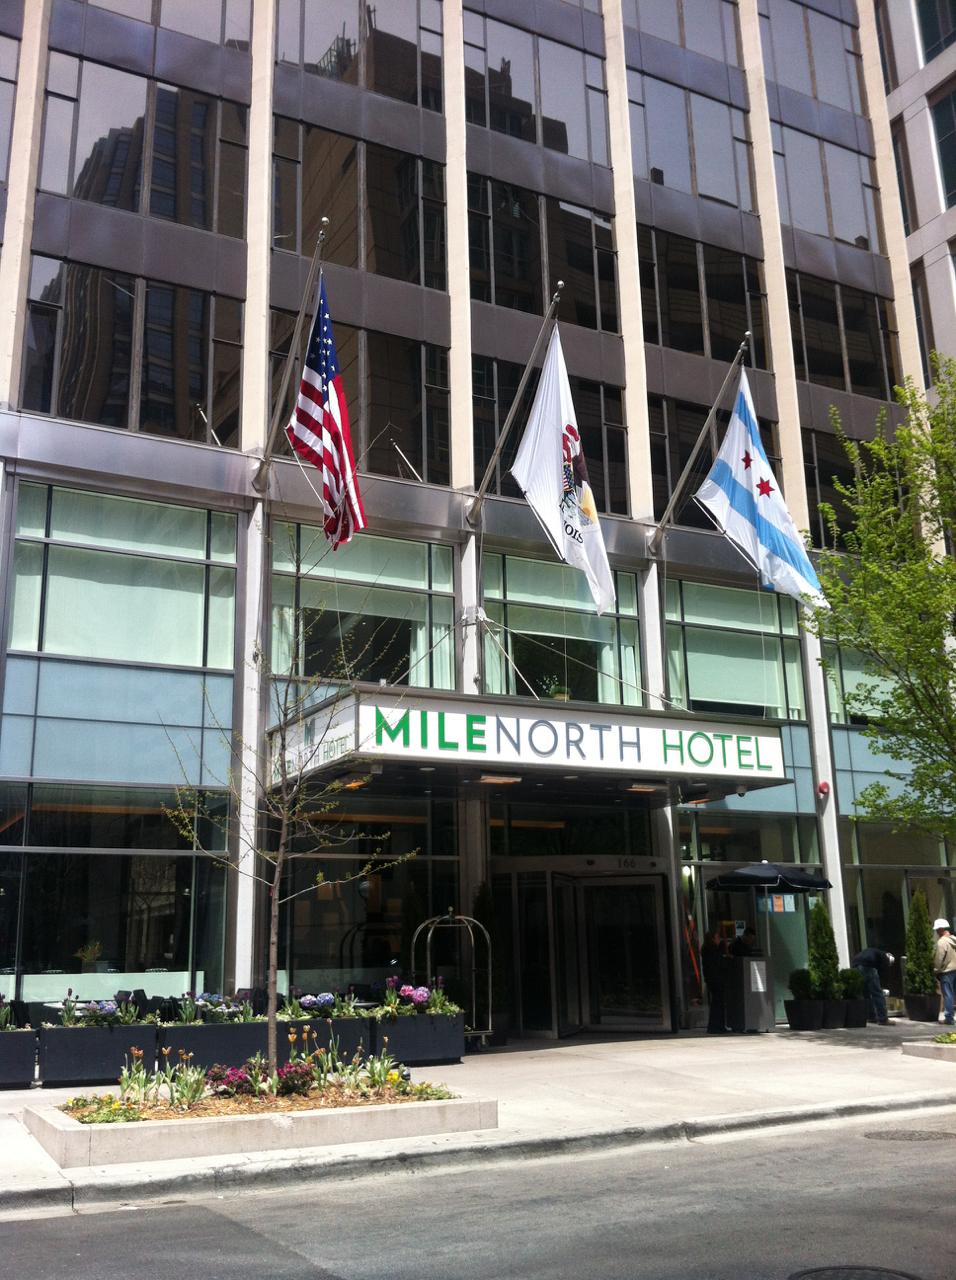 Mile North Hotel (Exterior), Chicago, IL